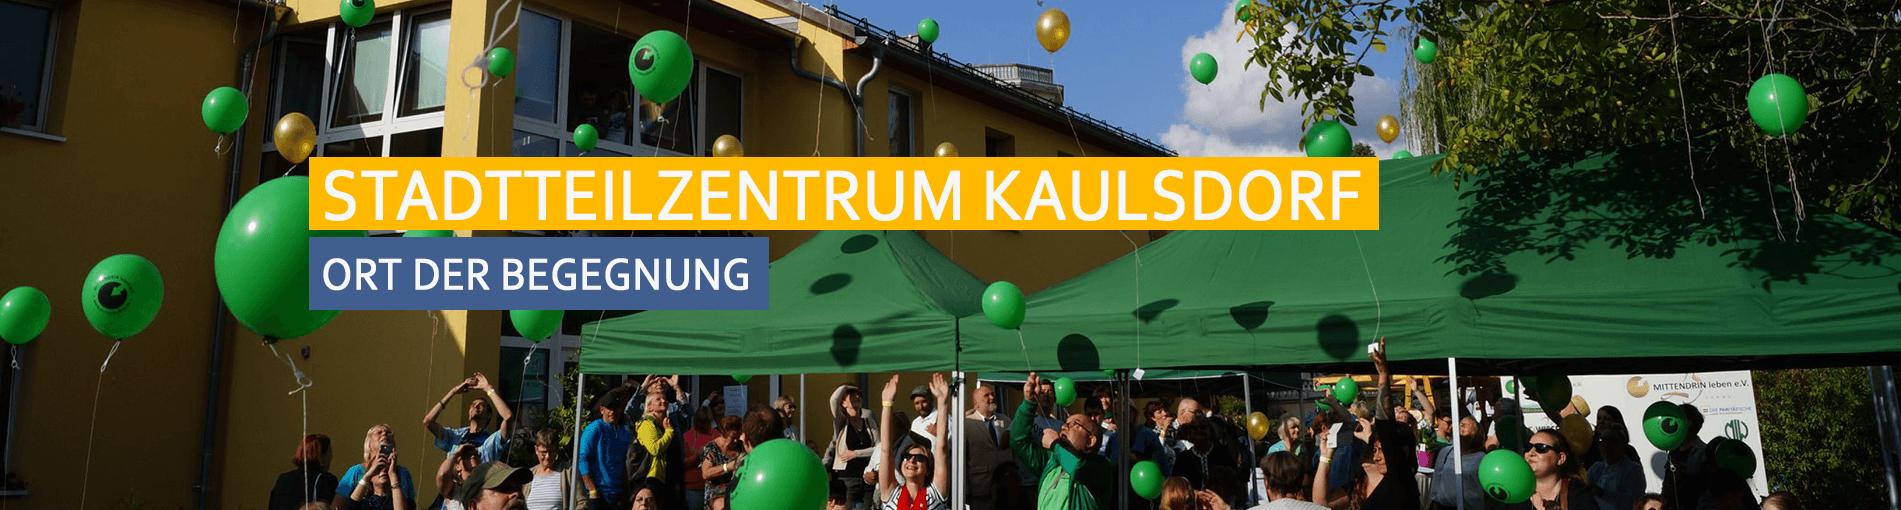 Header_STZ_Kaulsdorf